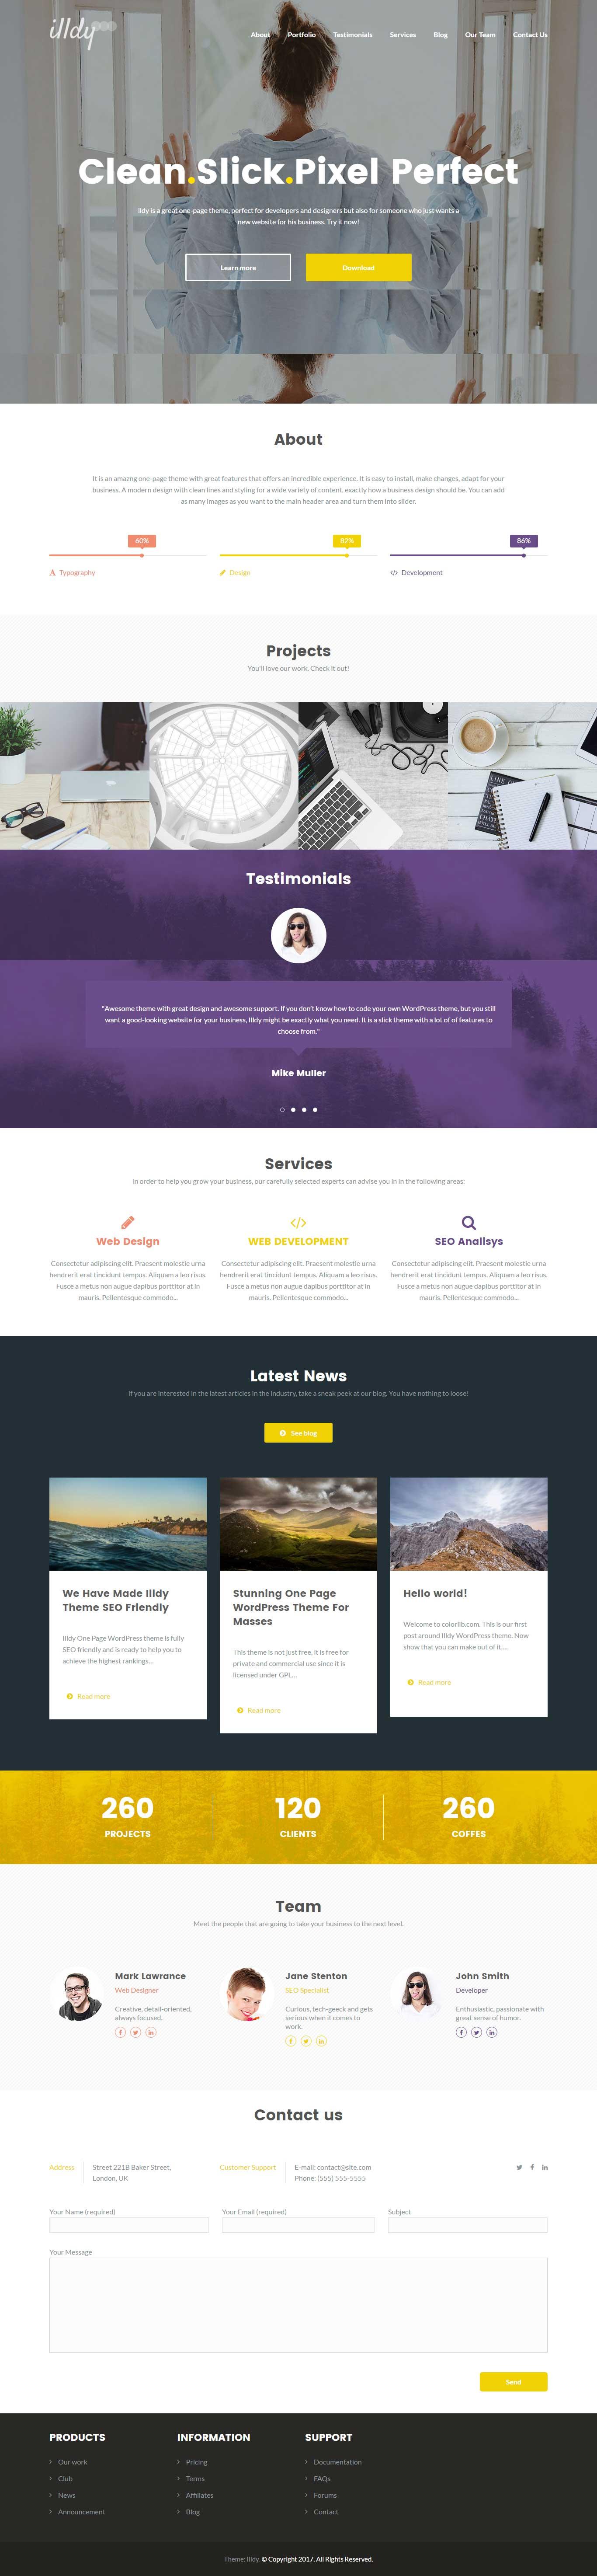 Illdy-free one page wordpress theme